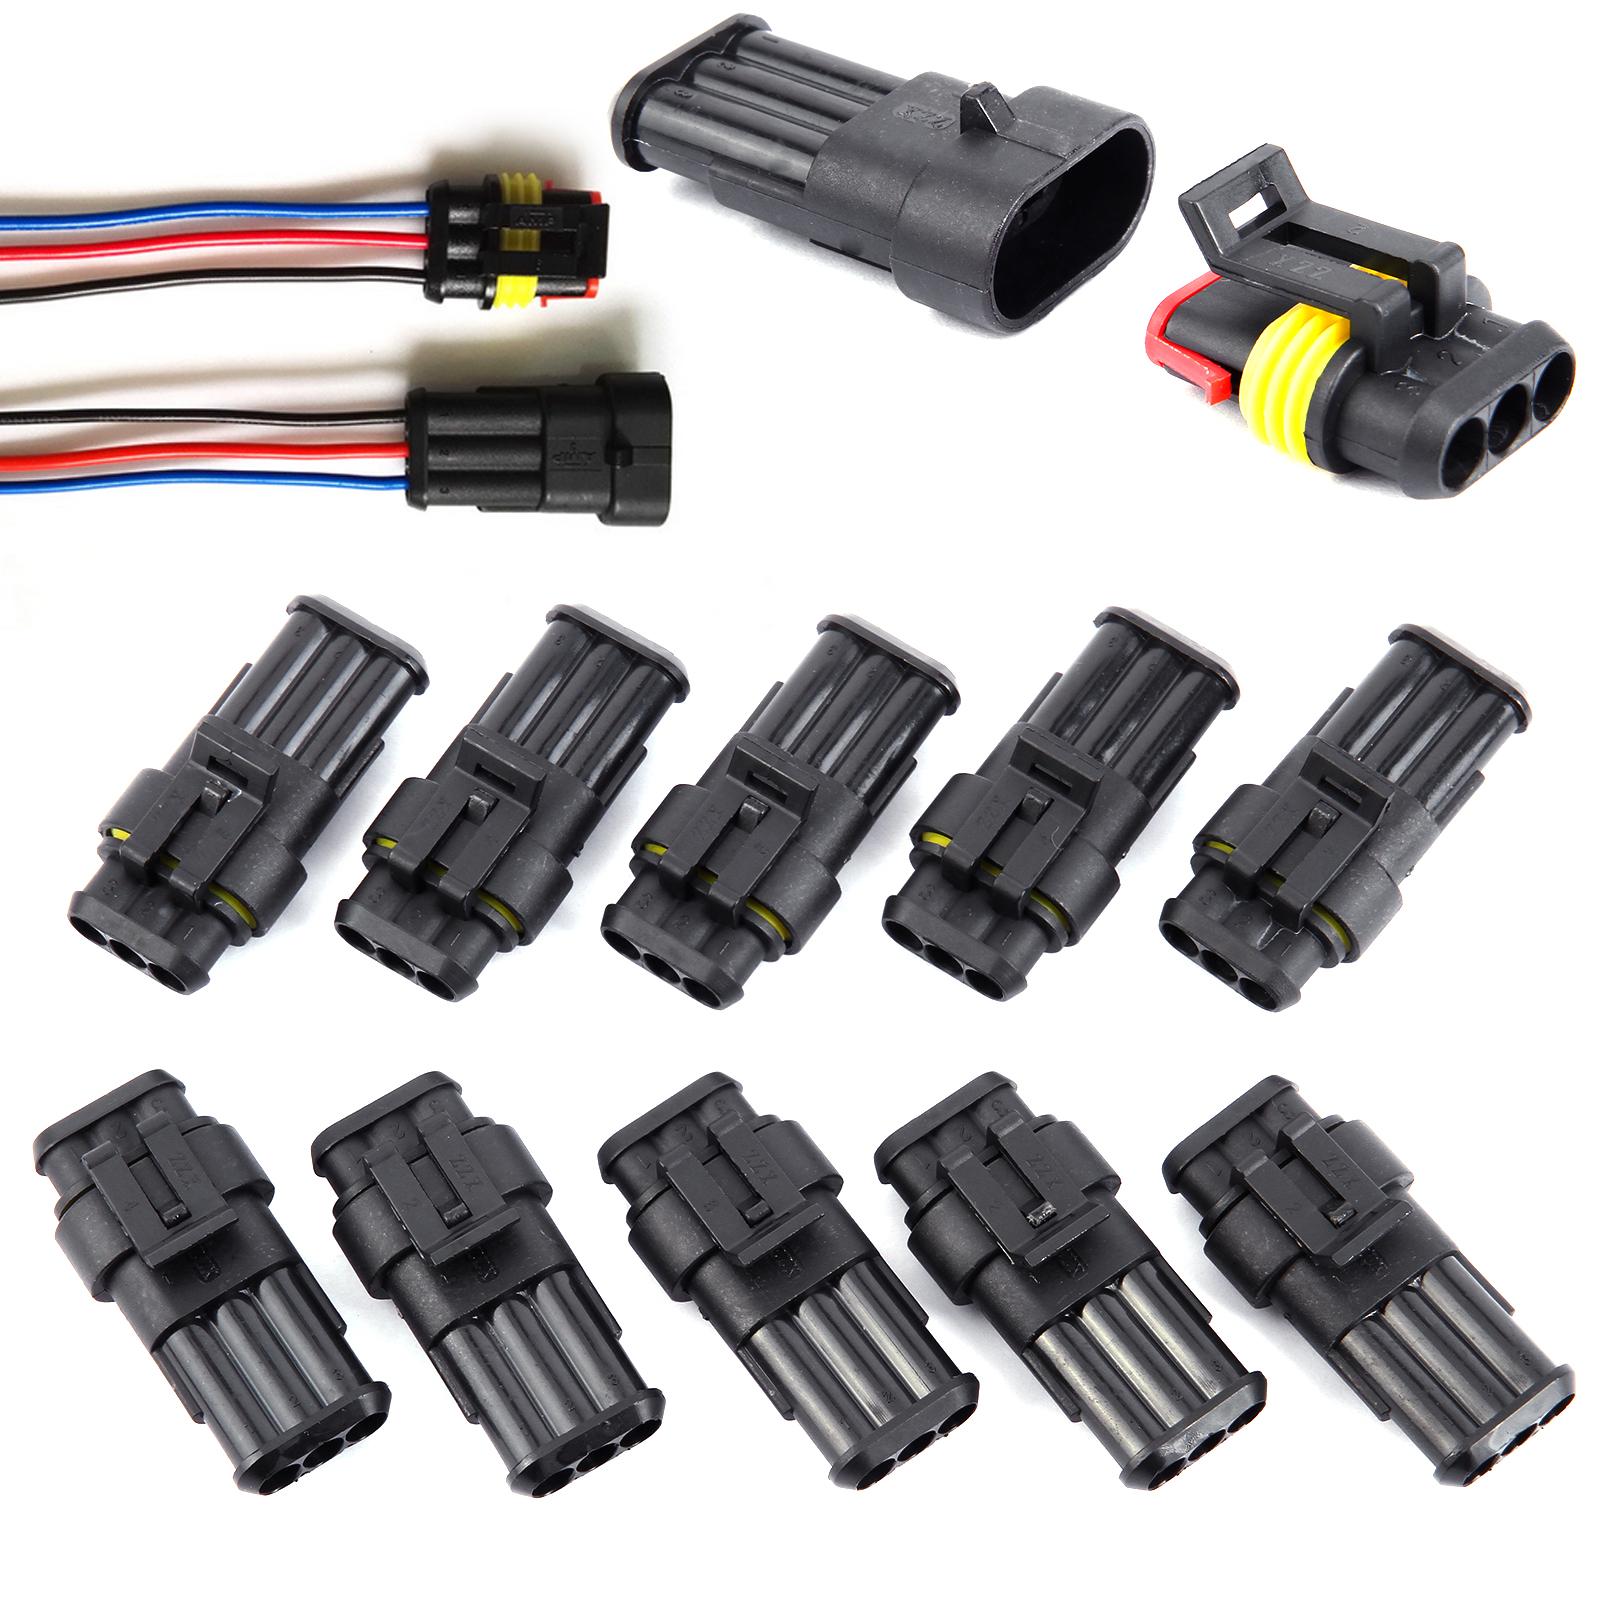 2 3 4 PIN WAY ELECTRICAL WATERPROOF CONNECTORS PLUG SET OF 5/10PCS ...